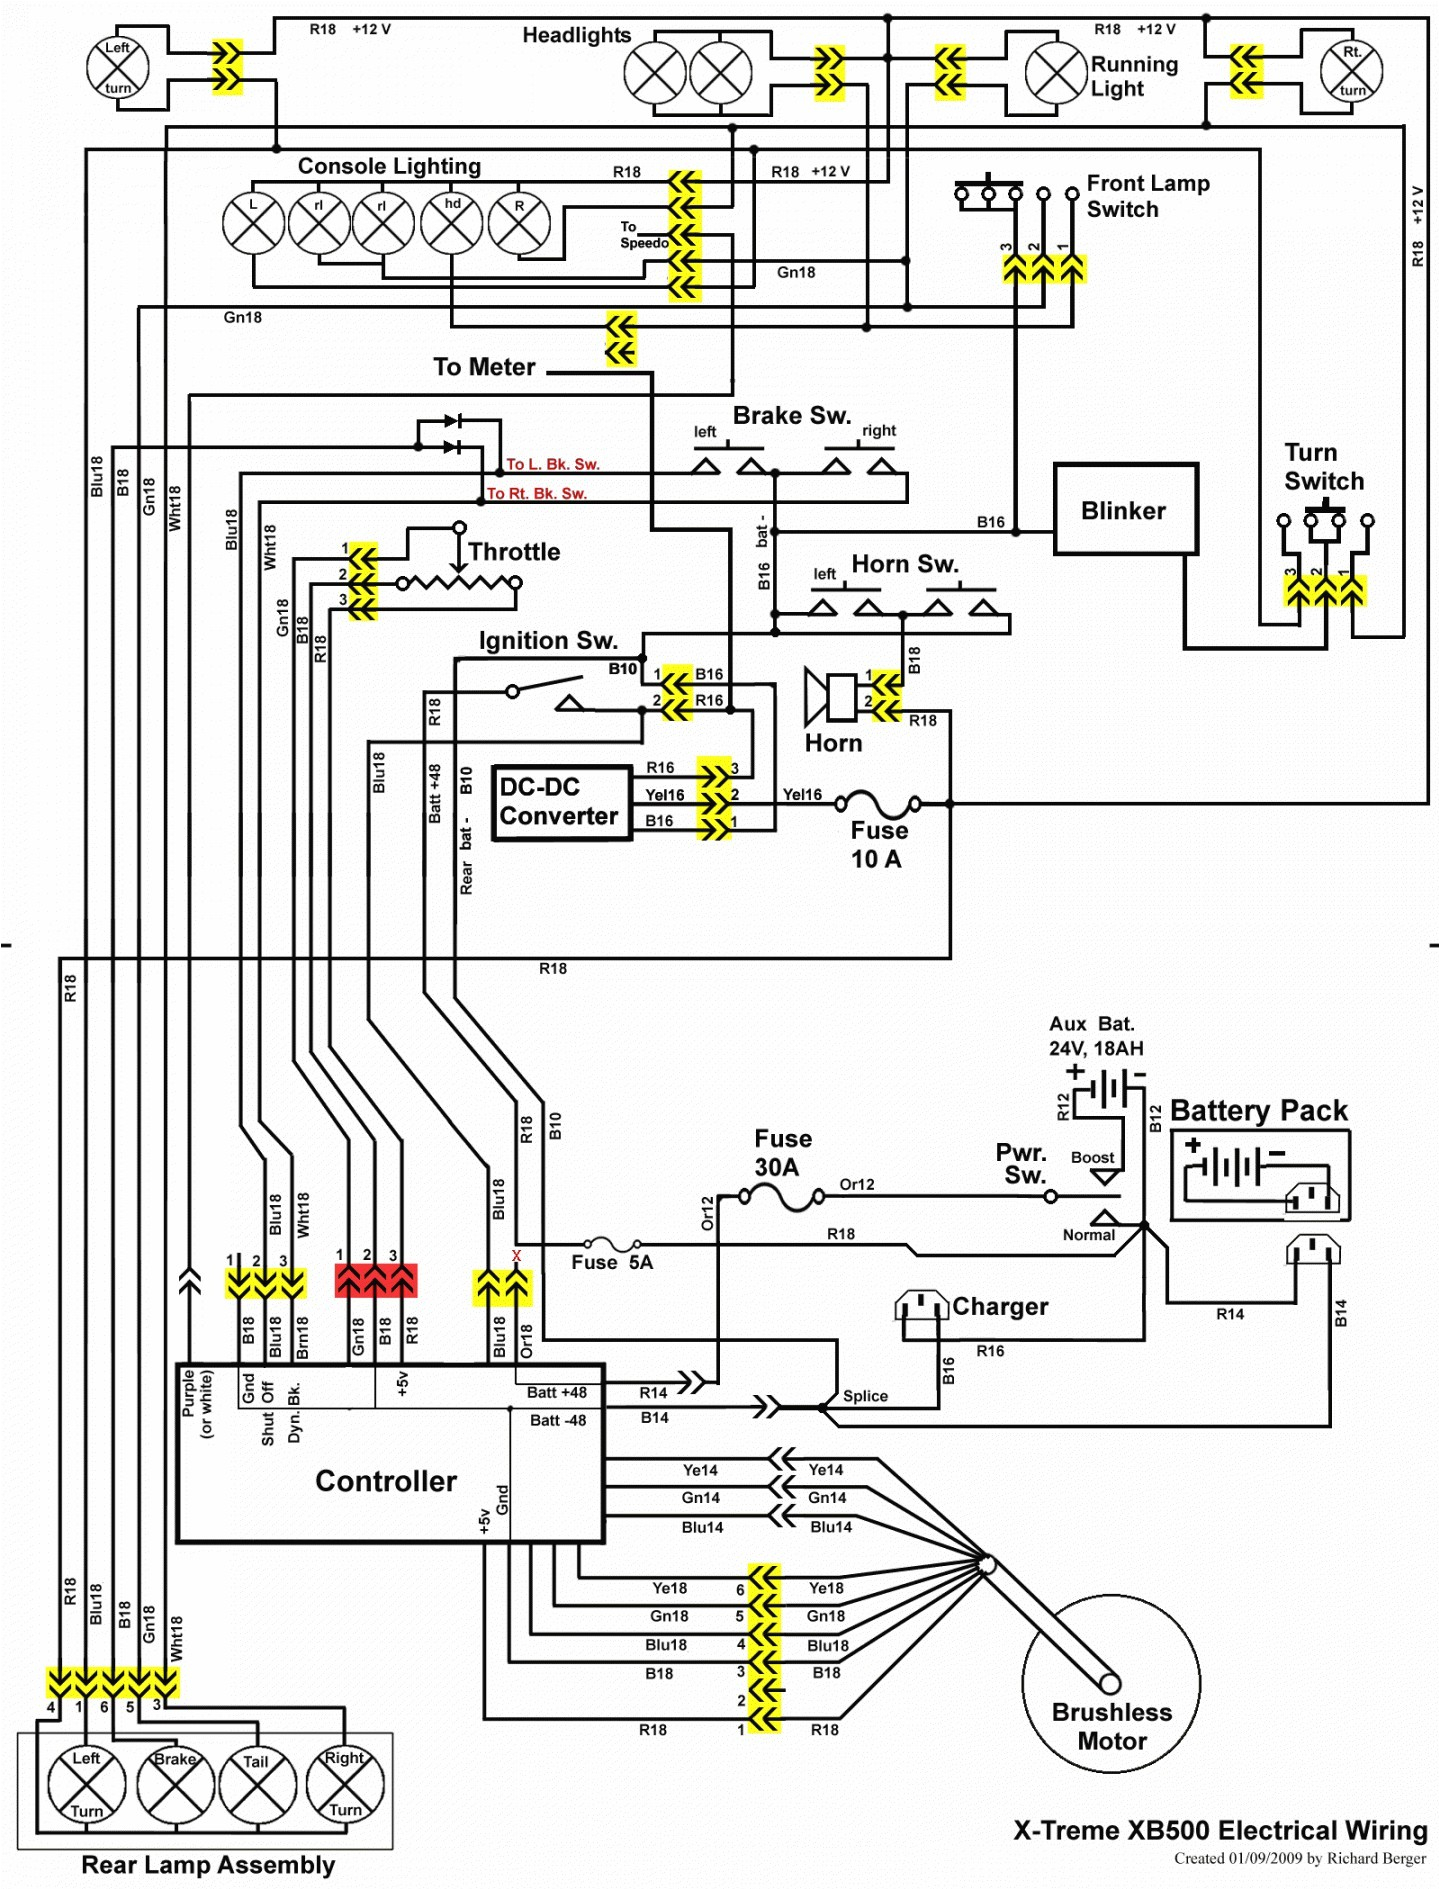 tao 50cc moped wiring diagram wiring diagram technic 2015 tao tao 50cc engine diagram wiring diagram